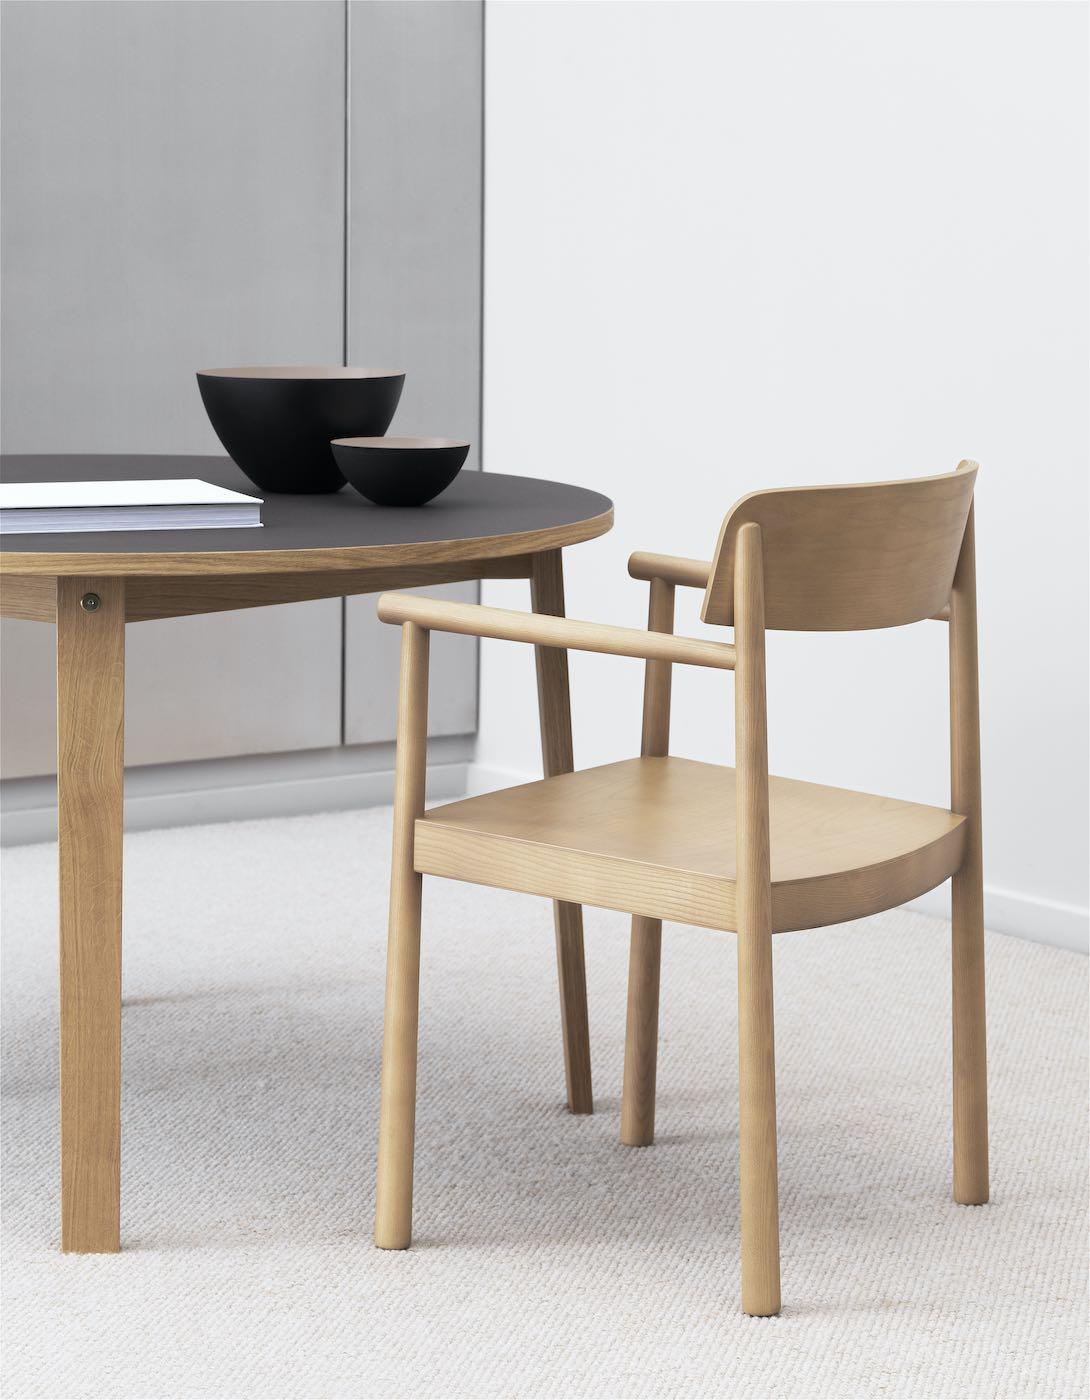 Skandinavische Stühle, Stuhl skandinavisch, Skandinavisches Design, Holzstuhl, 3daysofdesign